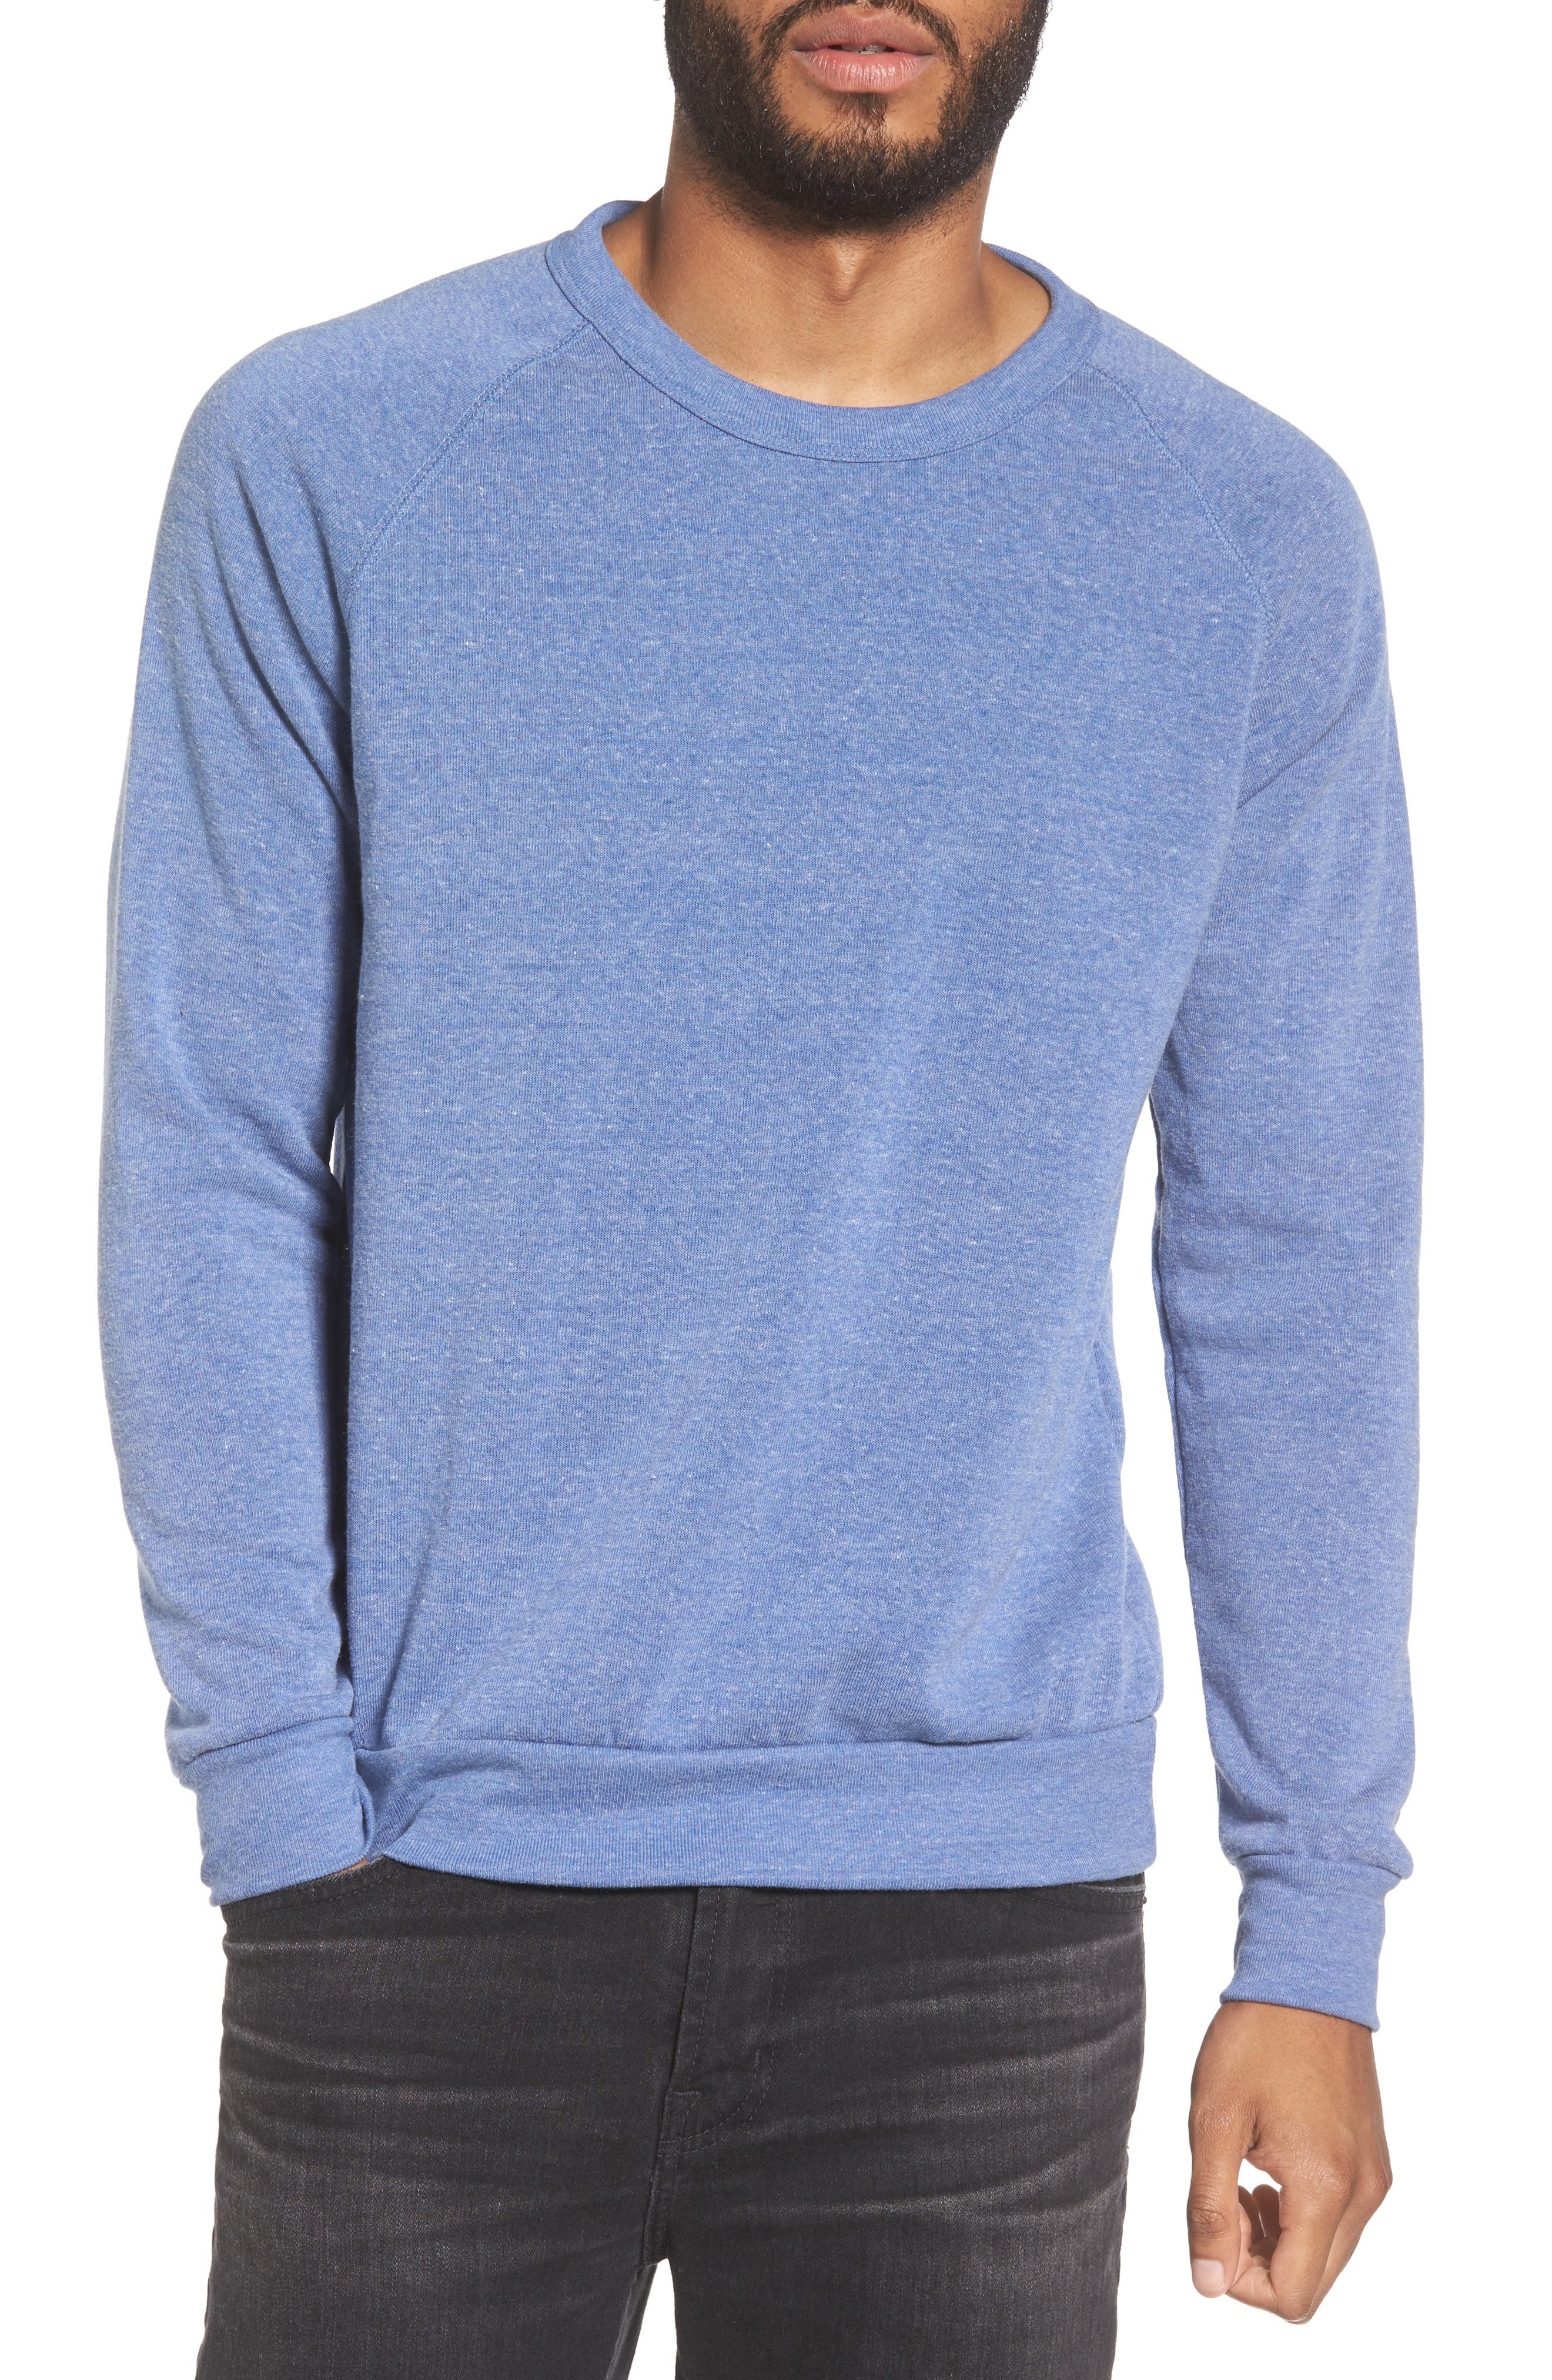 ALTERNATIVE The Champ Sweatshirt